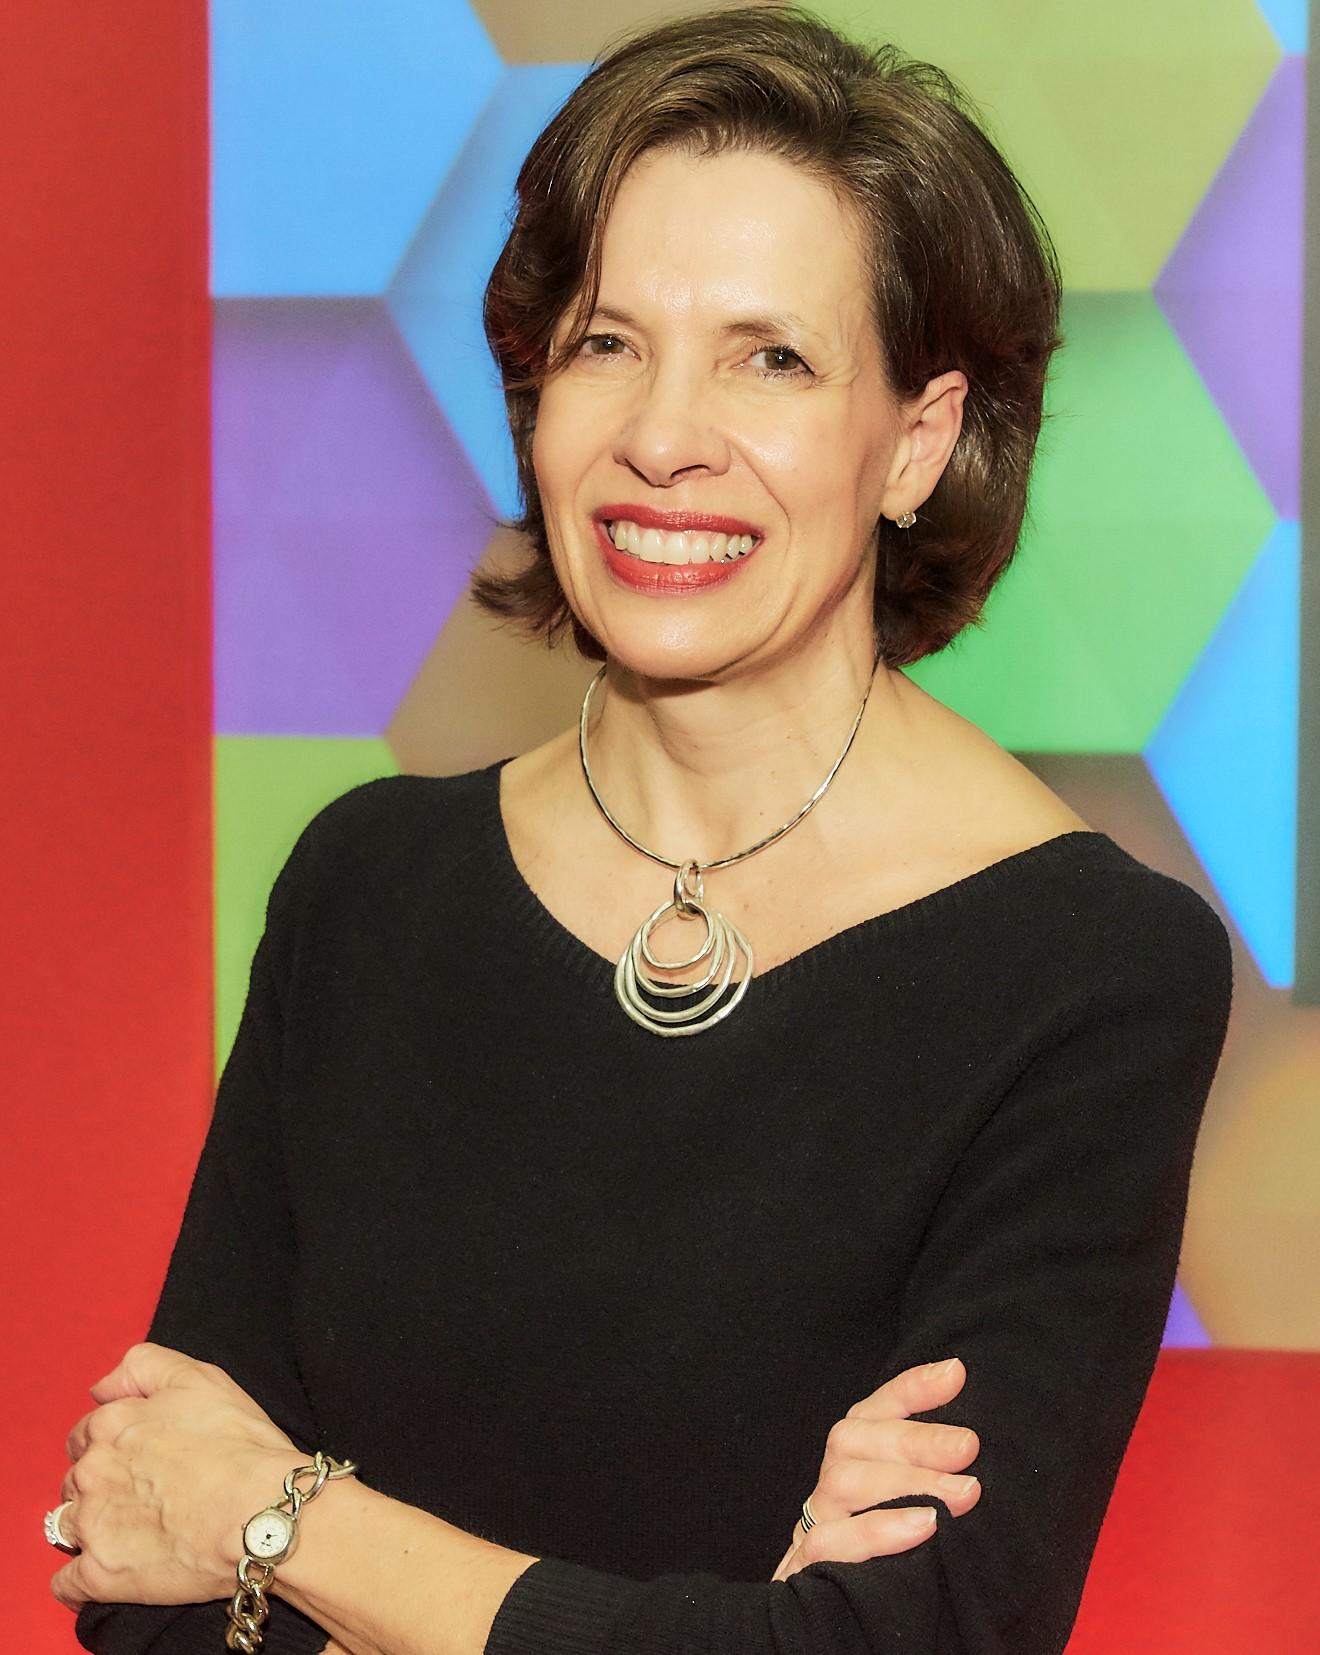 Amanda Fergusson